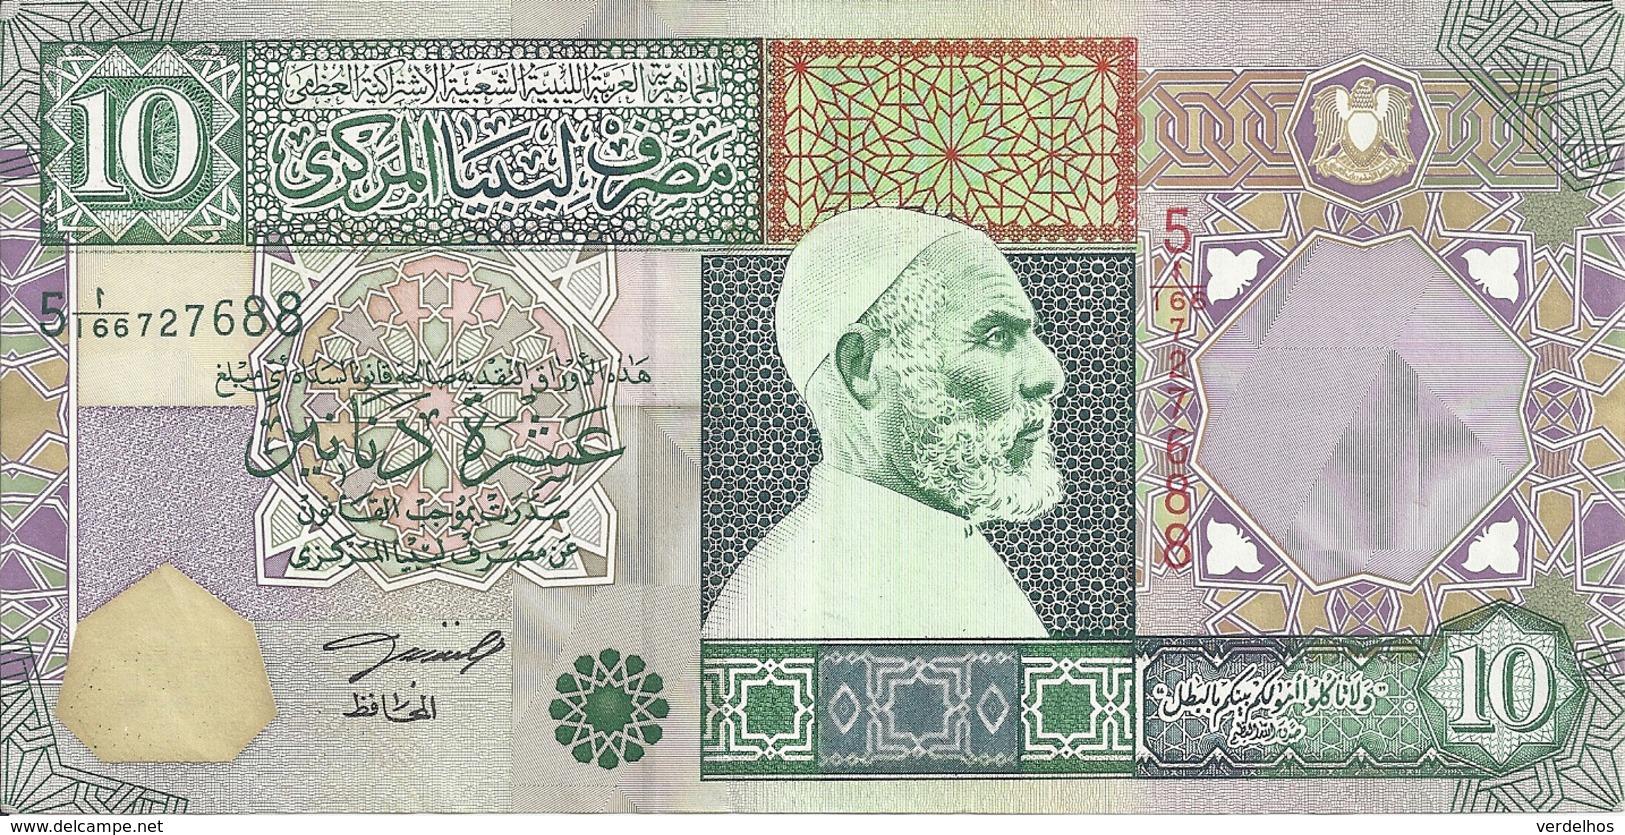 LIBYE 10 DINARS ND2002 XF+ P 66 - Libya